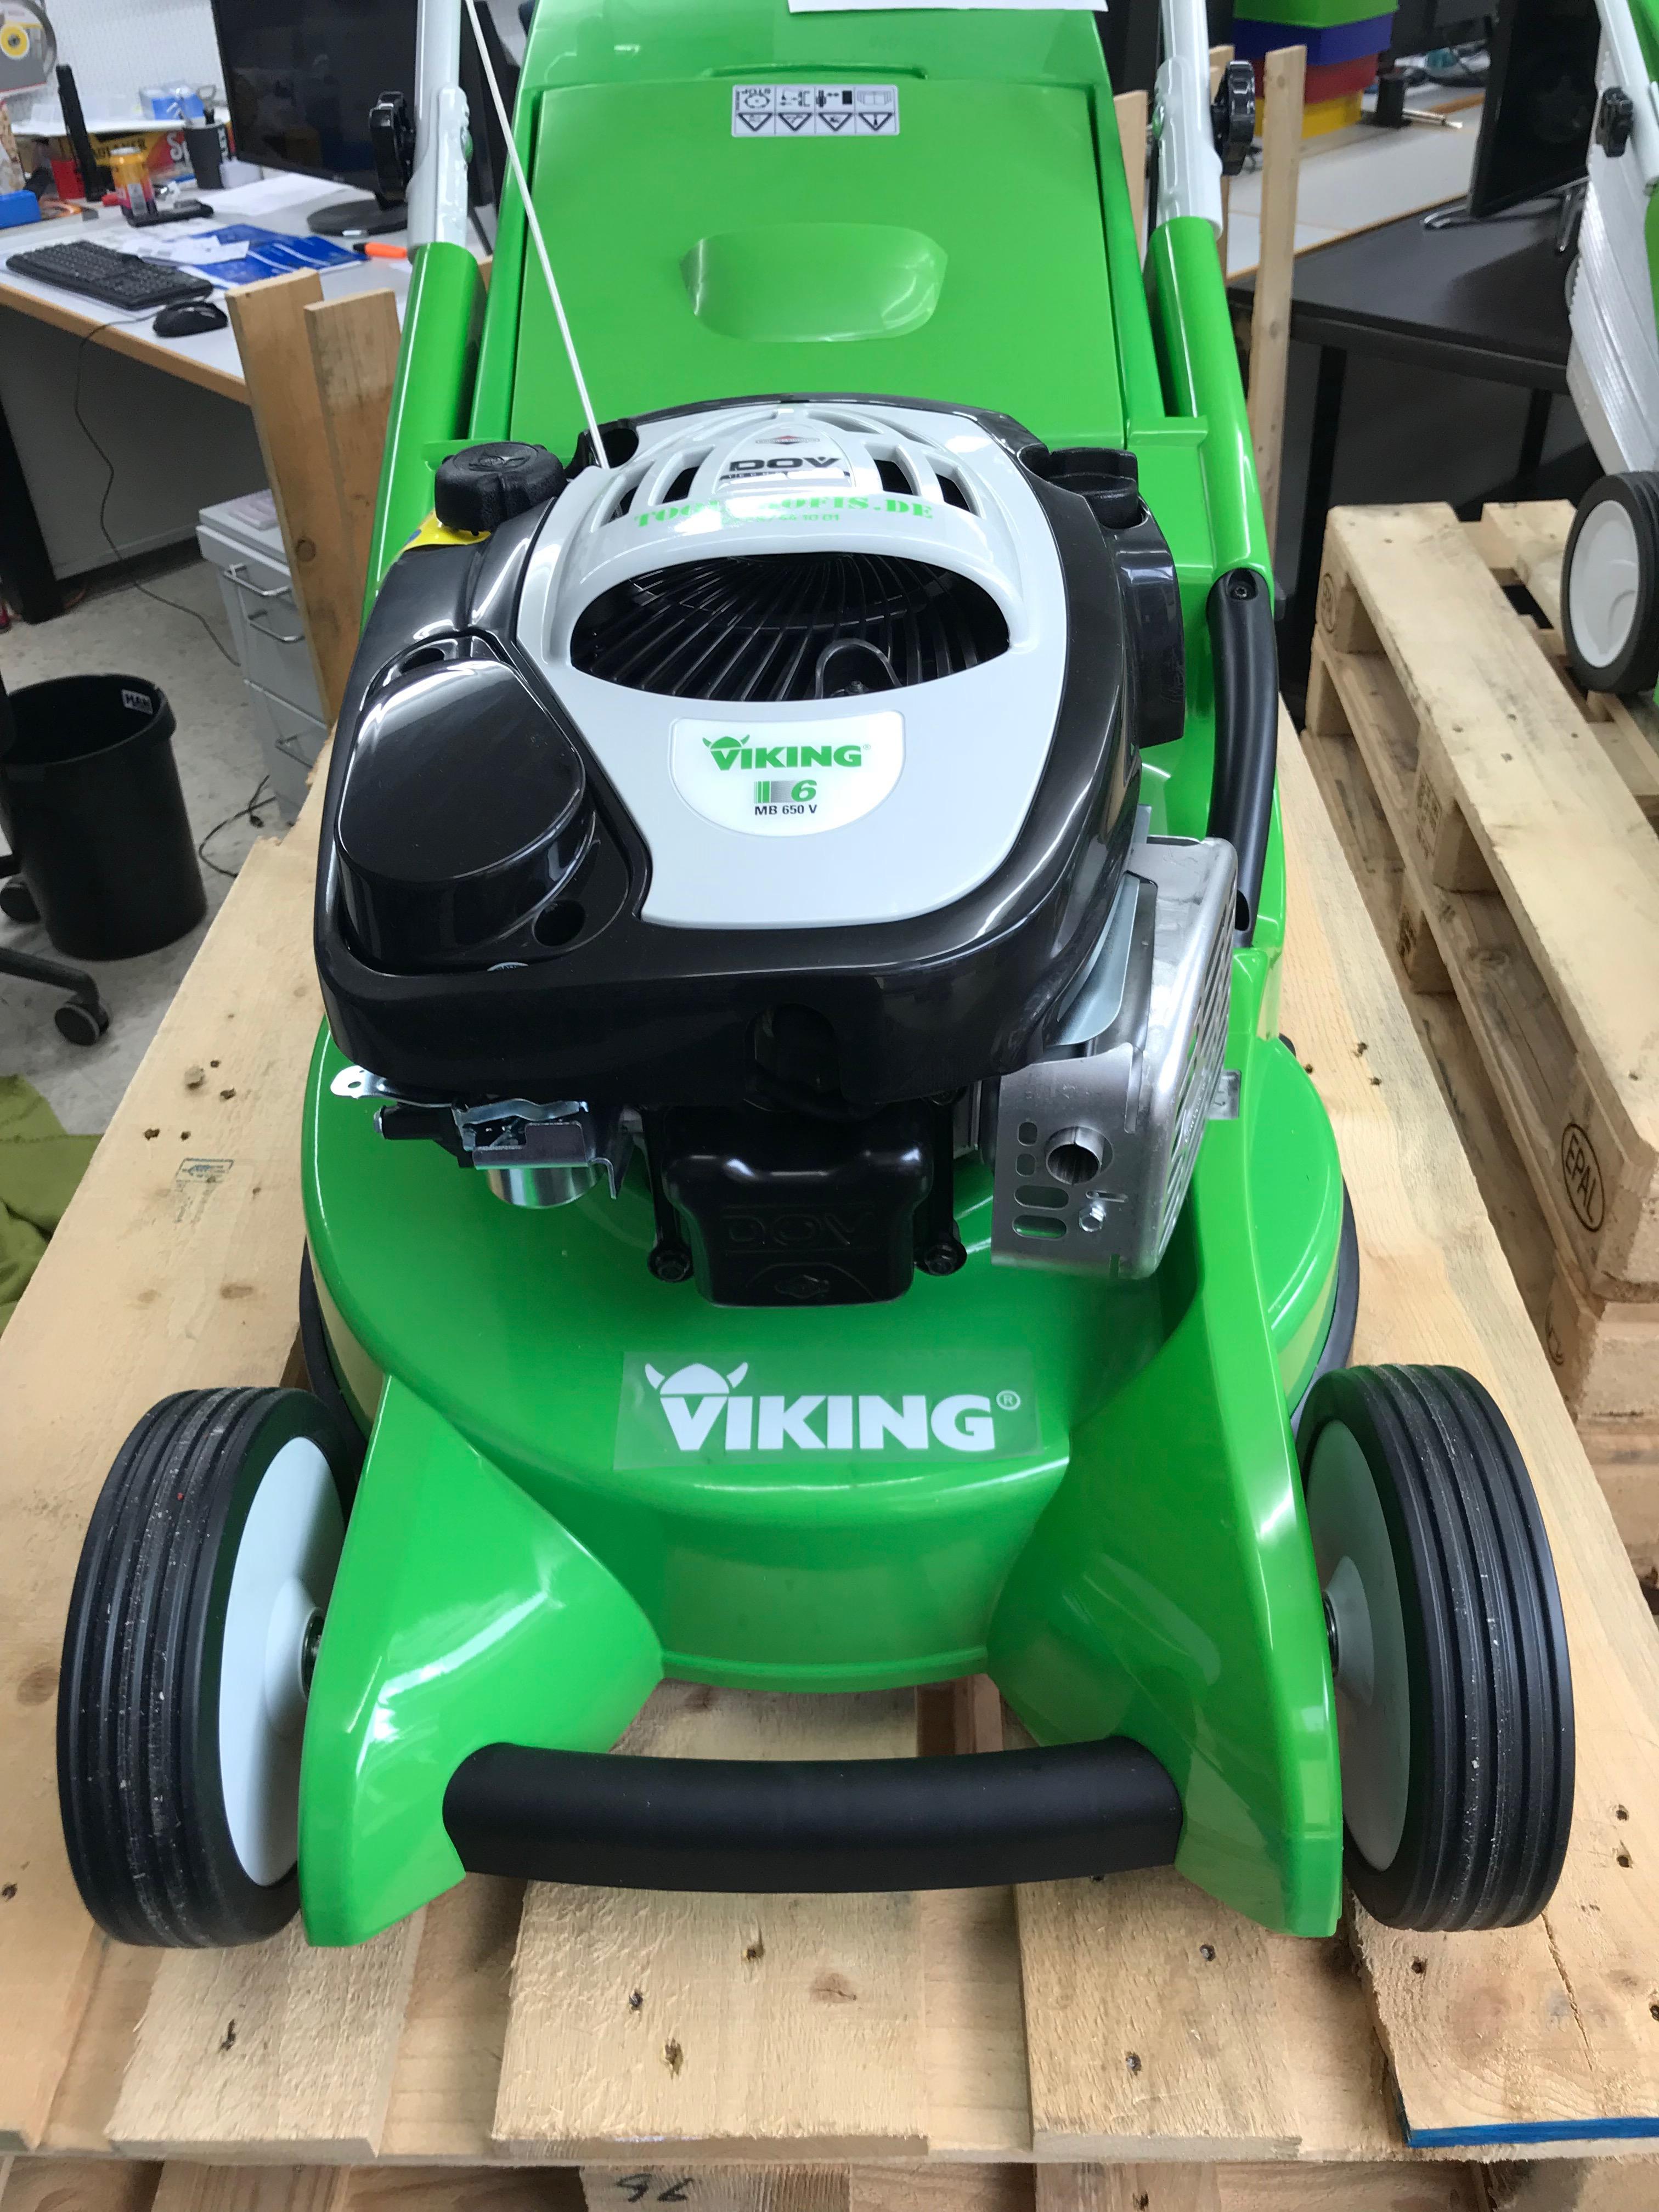 viking benzin rasenmäher mb 650 v 63600113412 48cm schnittbreite